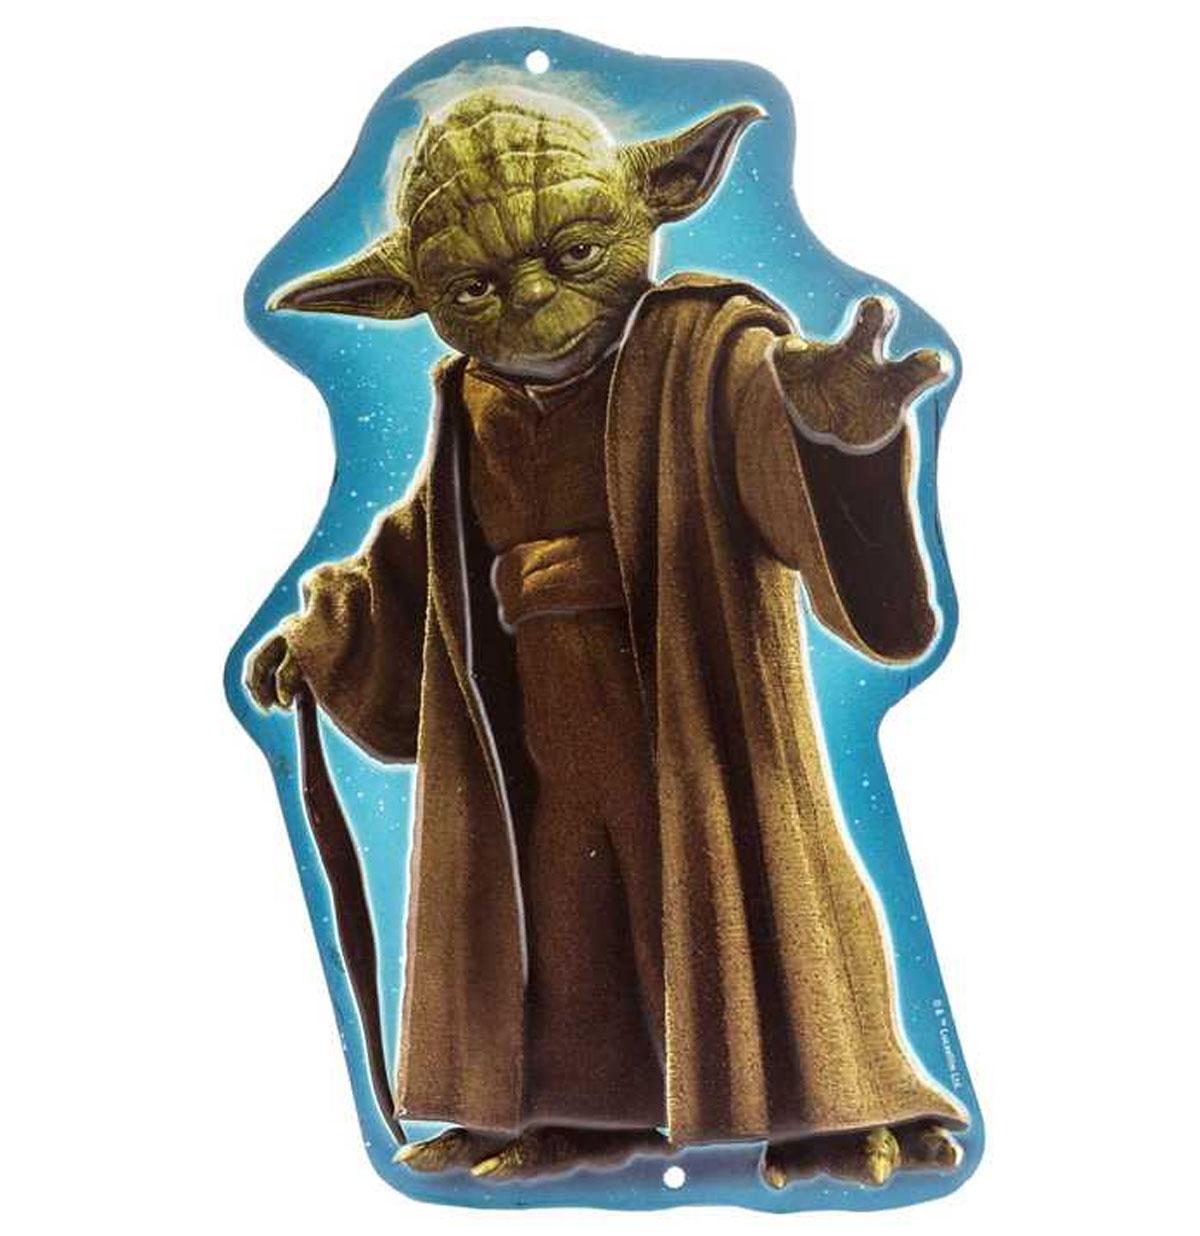 Star Wars Yoda Reliëf Tinnen Bord